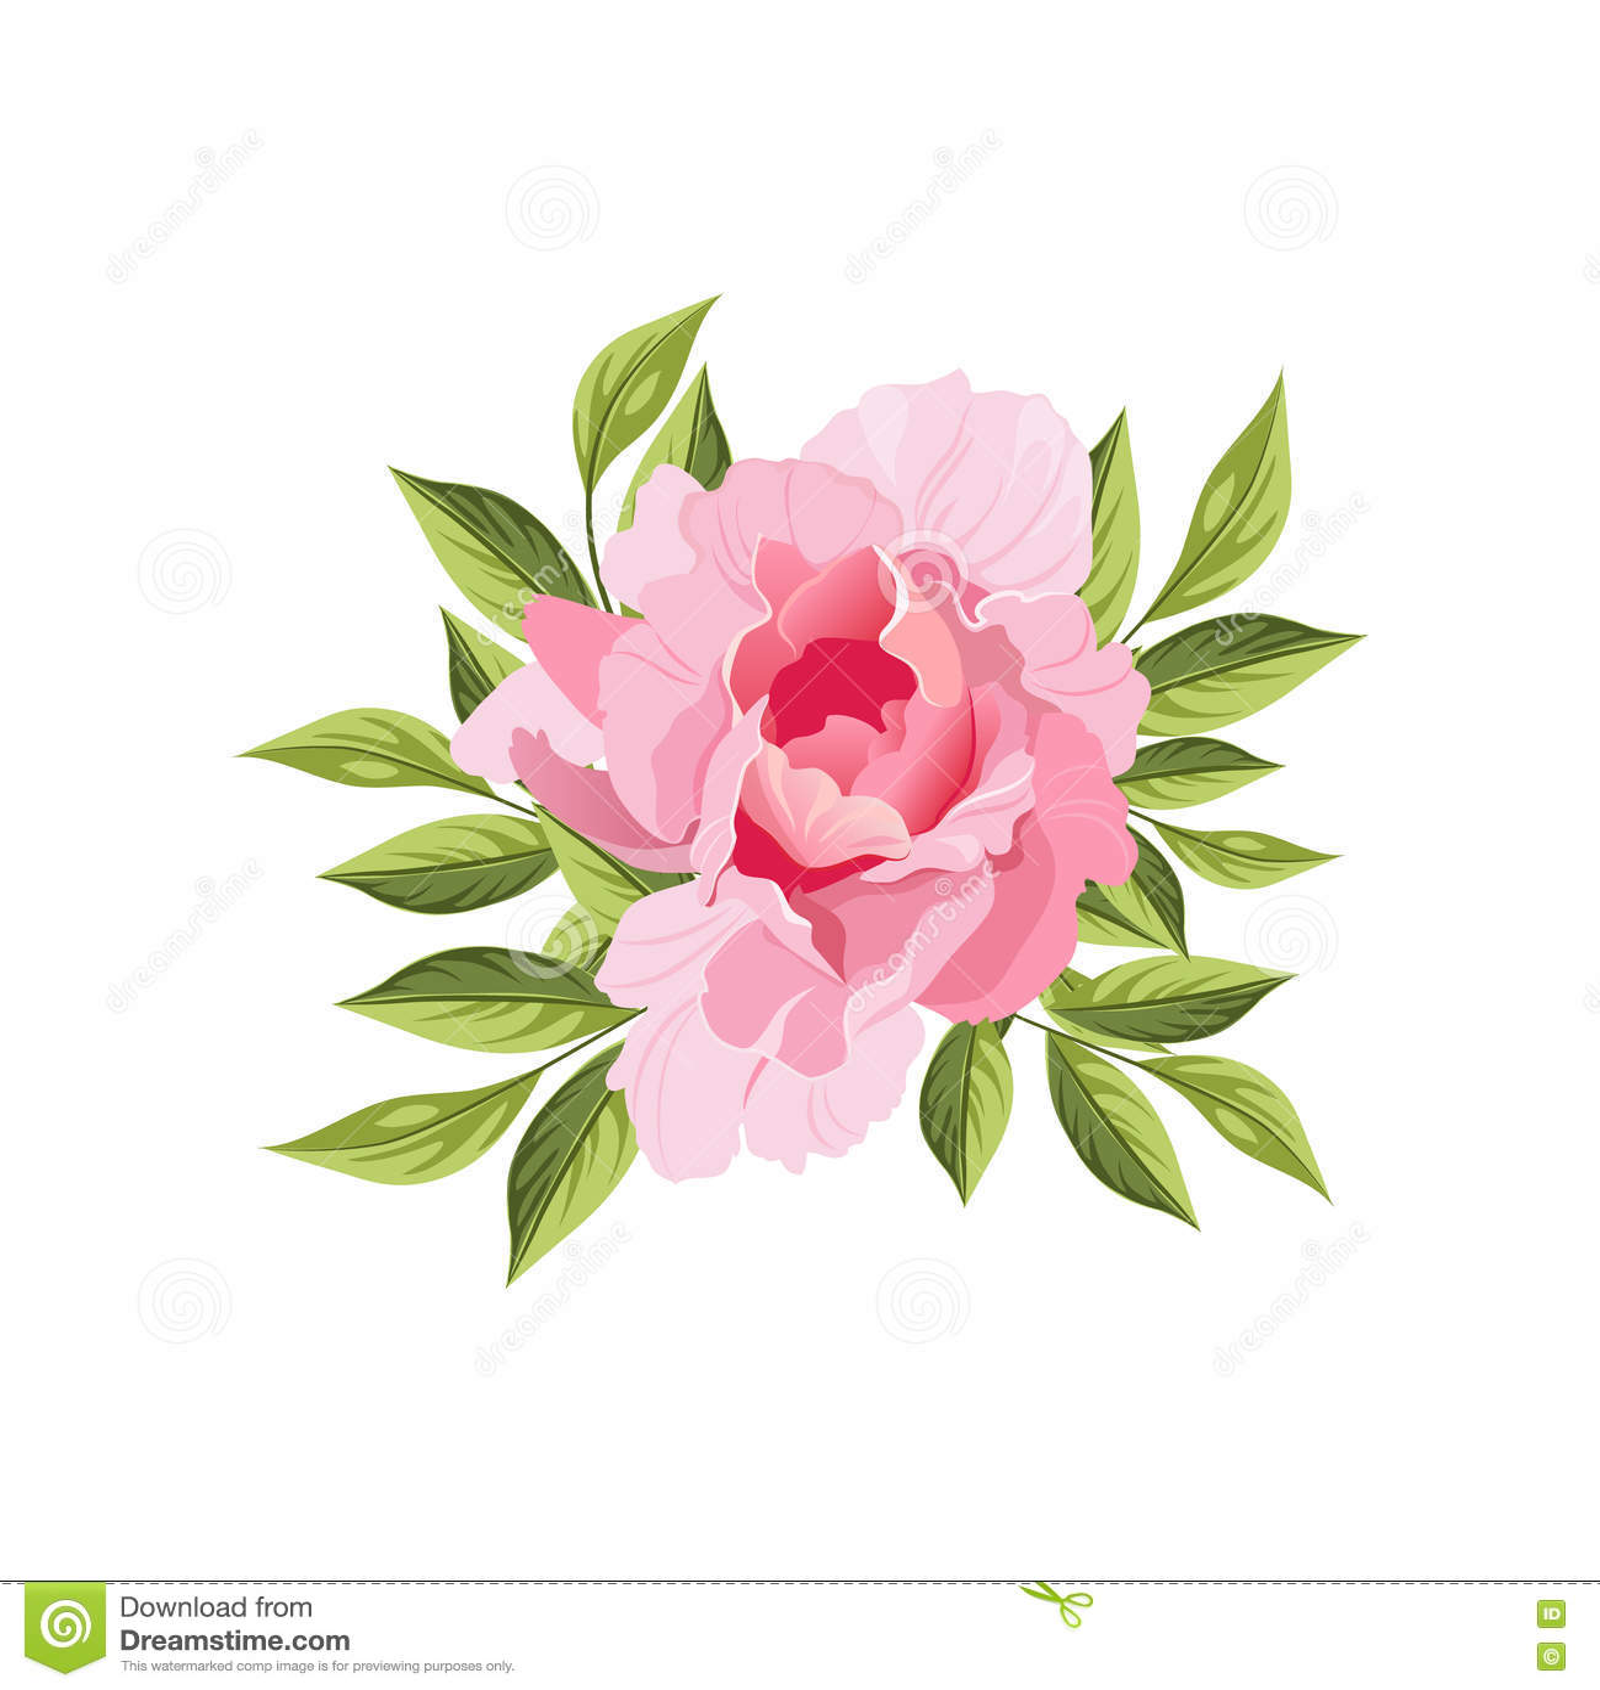 Beautiful english flower garden - Peony Hand Drawn Realistic Illustration Stock Vector